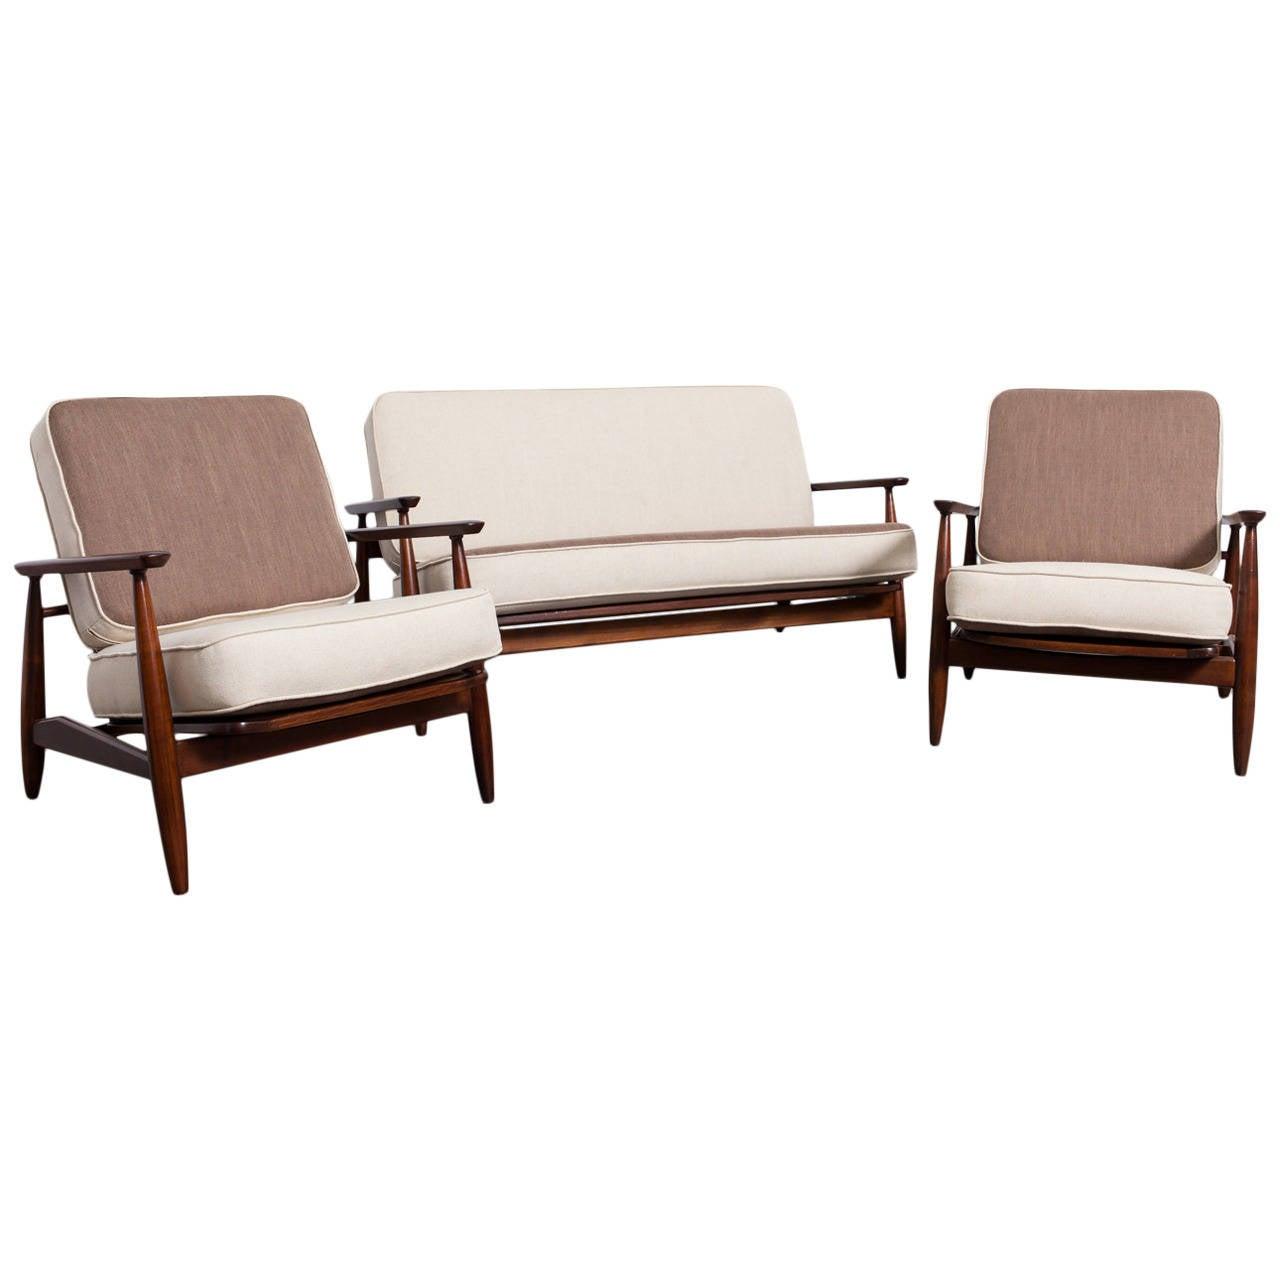 Dutch Modernist Stick Sofa Set At 1stdibs